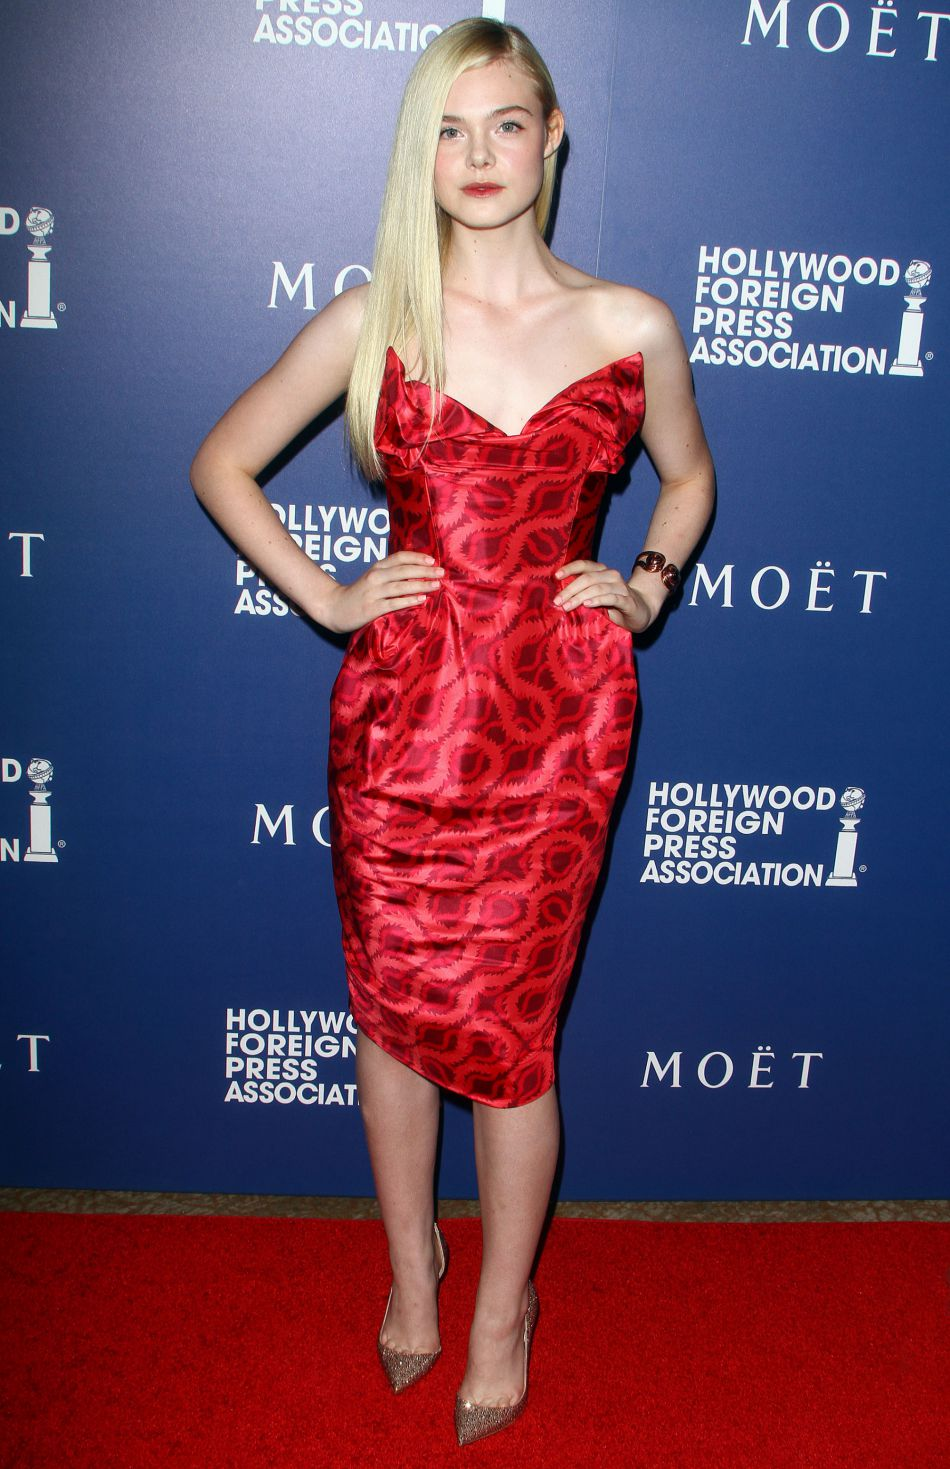 Elle Fanning adopte un look sexy avec sa robe rouge bustiée.